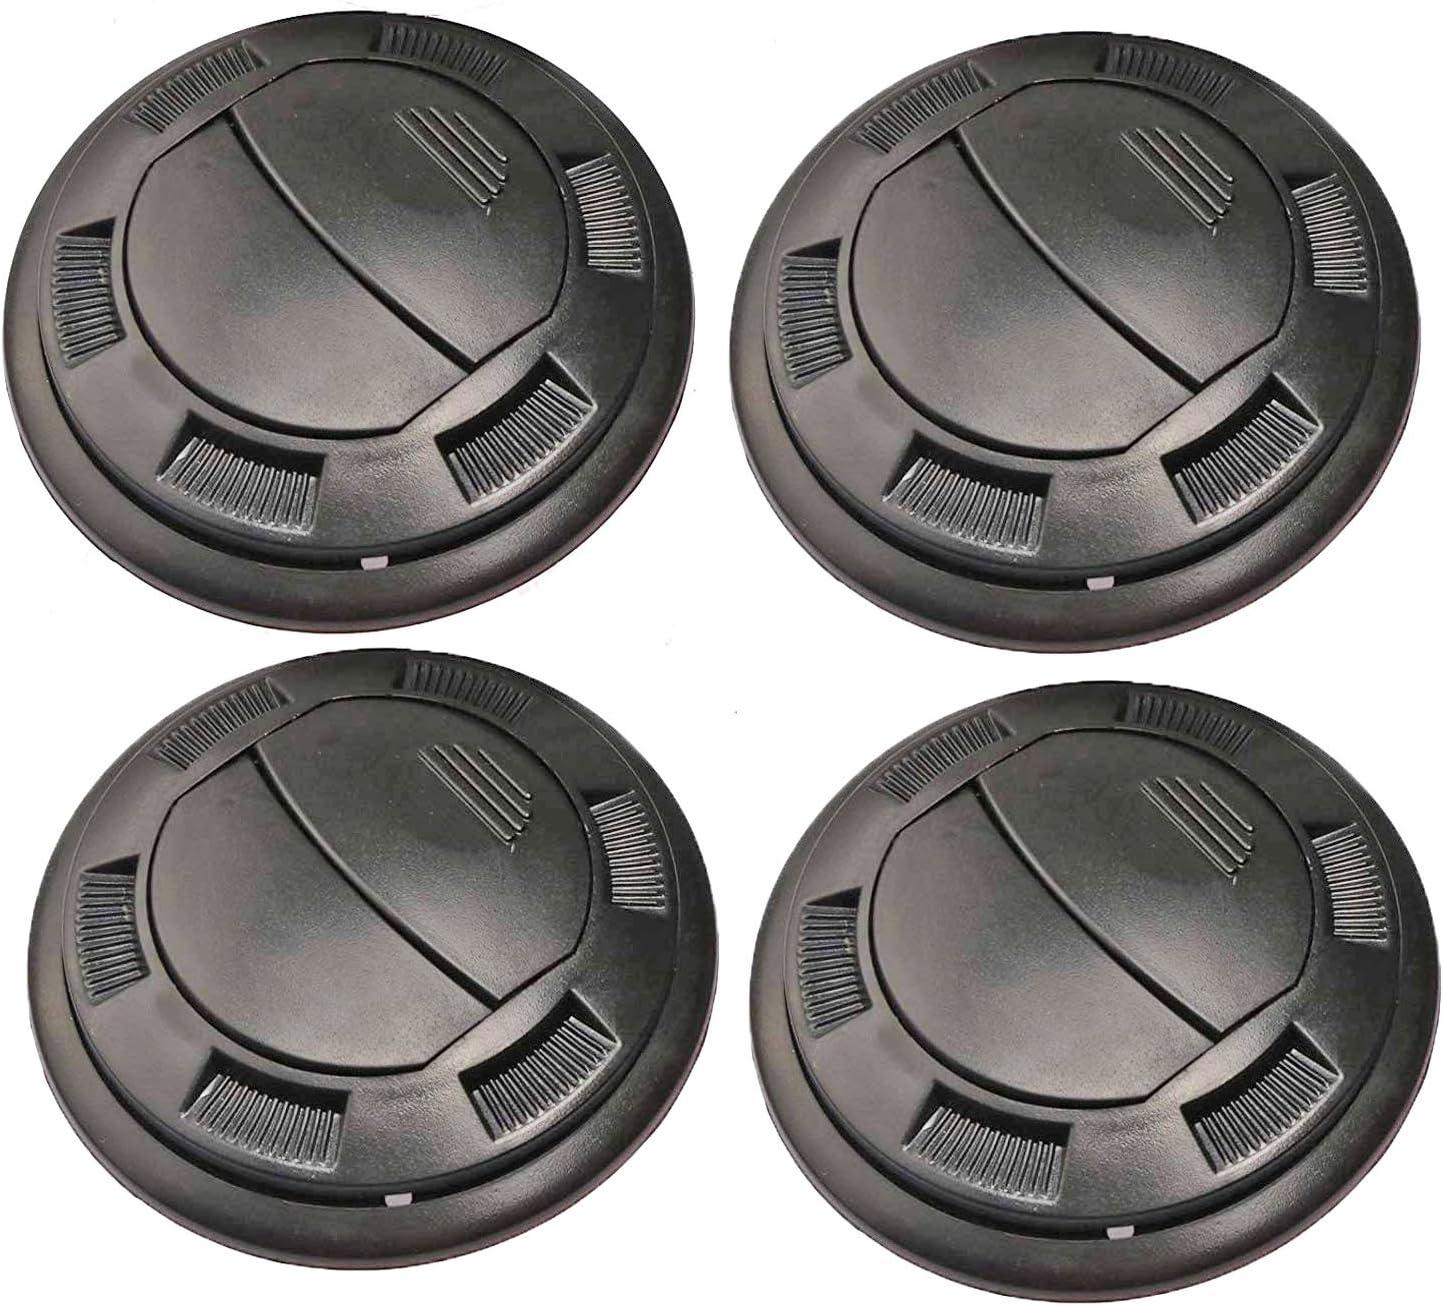 Mover Parts 6674231 4PCS Cab Heater Vent Cover Louver for Bobcat 751 753 763 773 863 864 873 883 963 320 322 323 5600 5610 S100 S130 S150 S160 S175 S185 S205 S220 S250 S300 A220 A300 T110 T140 T180